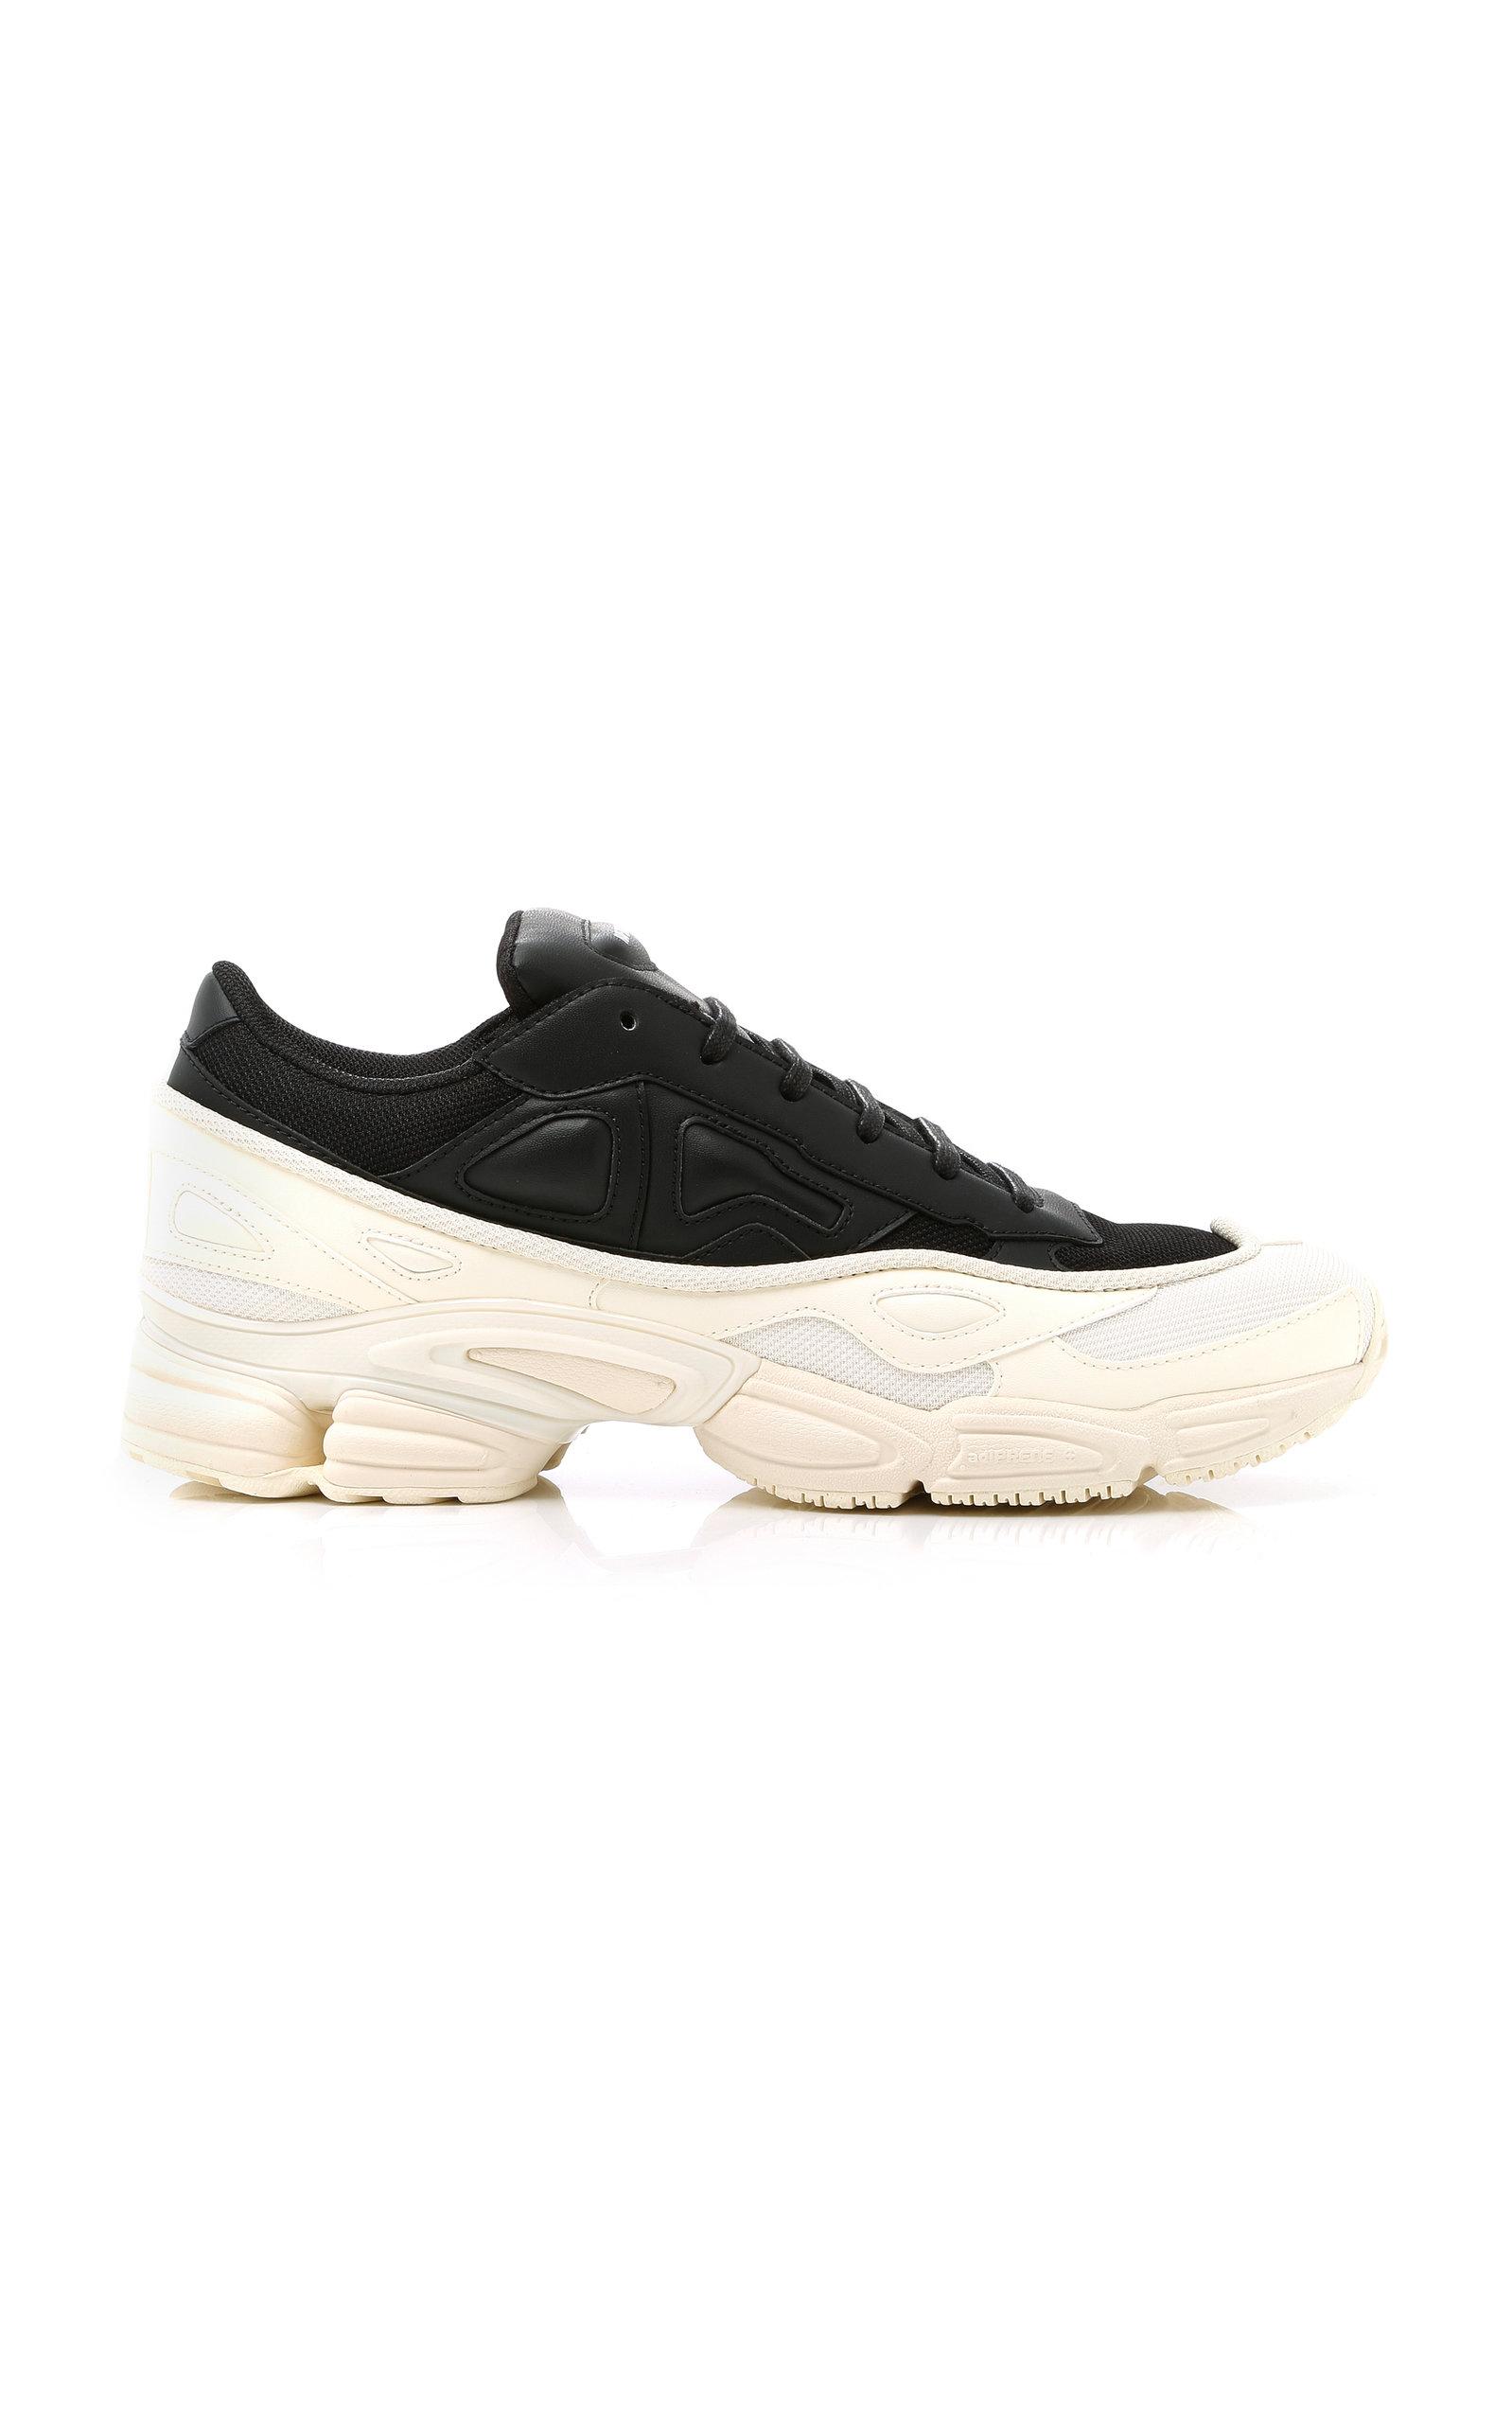 d407a467db3da adidas by Raf SimonsUnisex RS Replicant Ozweego Sneakers. CLOSE. Loading